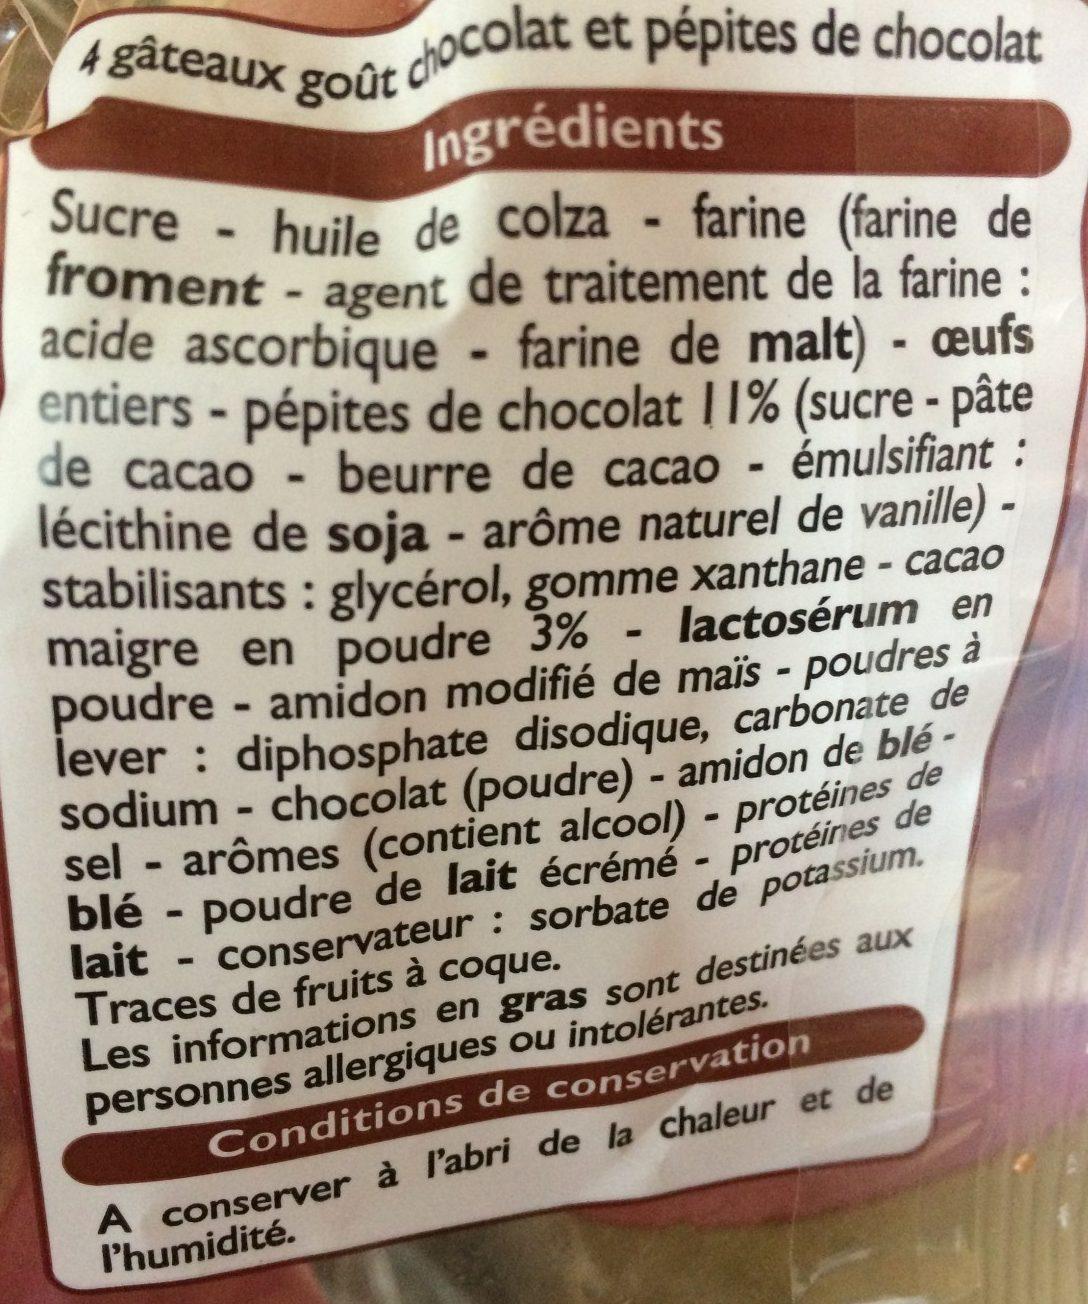 Muffins goût Chocolat aux pépites de chocolat - Ingrediënten - fr